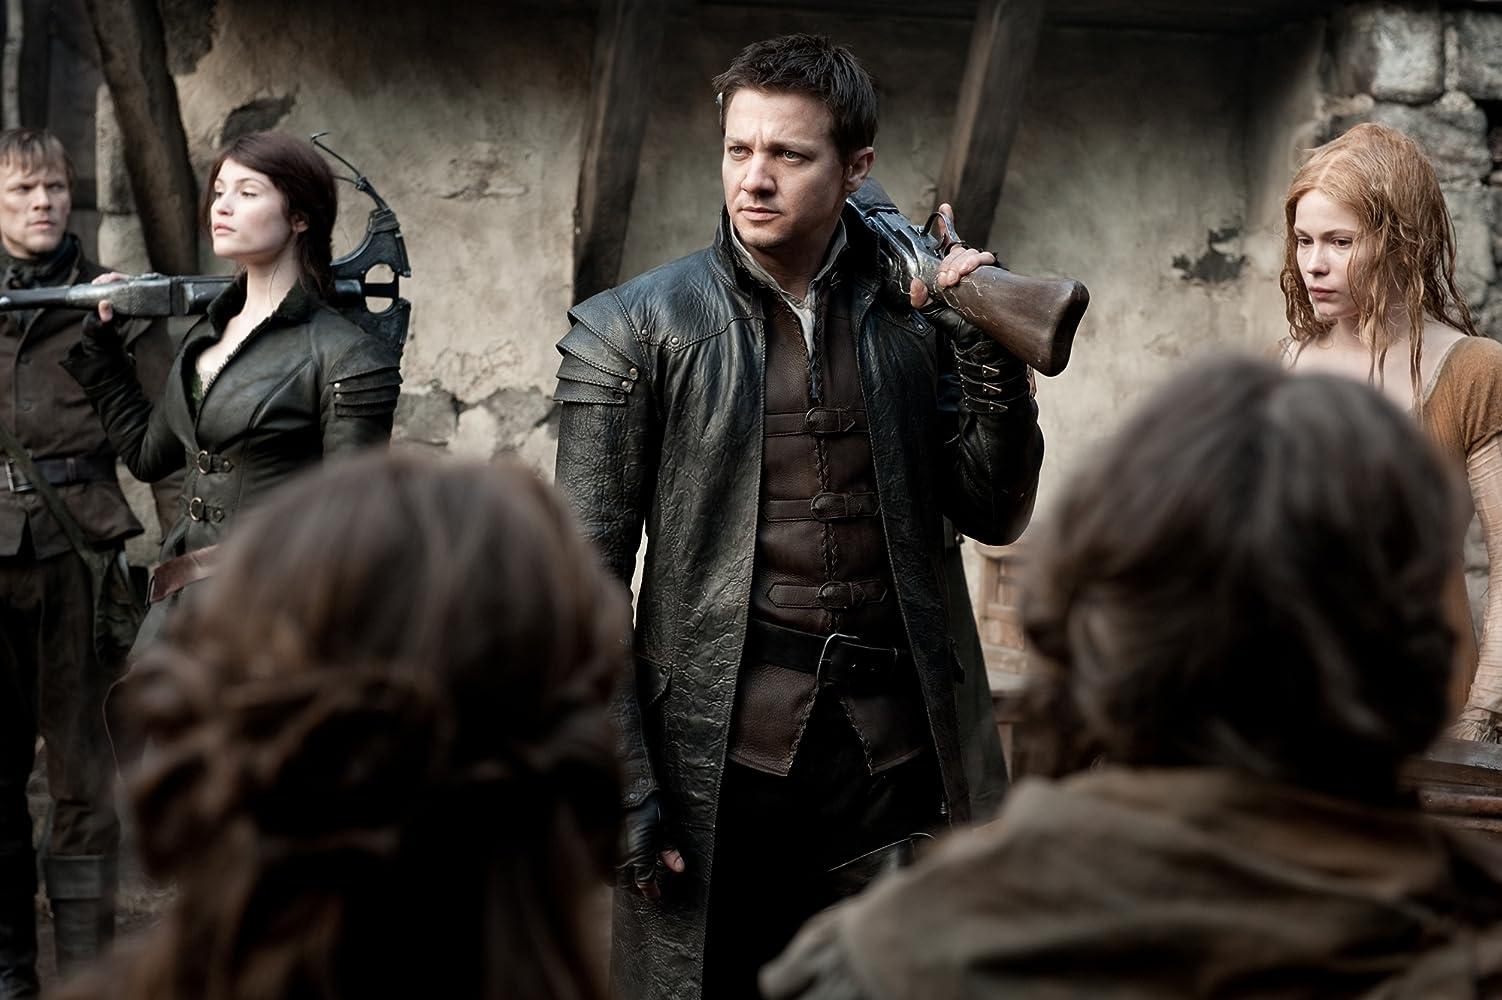 Jeremy Renner, Pihla Viitala, and Gemma Arterton in Hansel & Gretel: Witch Hunters (2013)